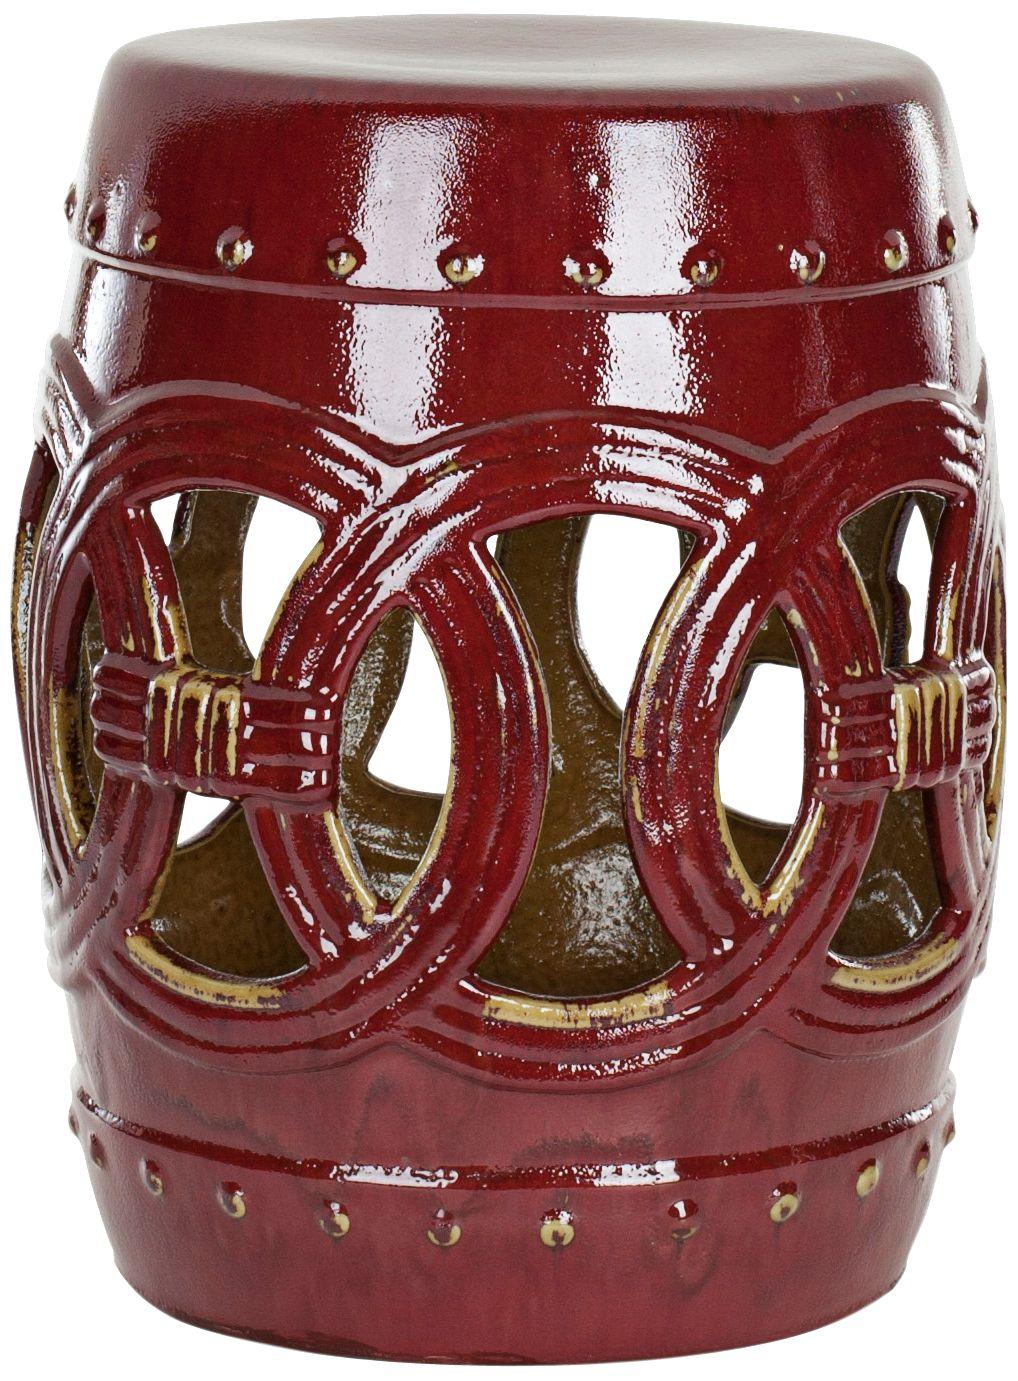 Safavieh Double Coin Deep Red Ceramic Garden Stool